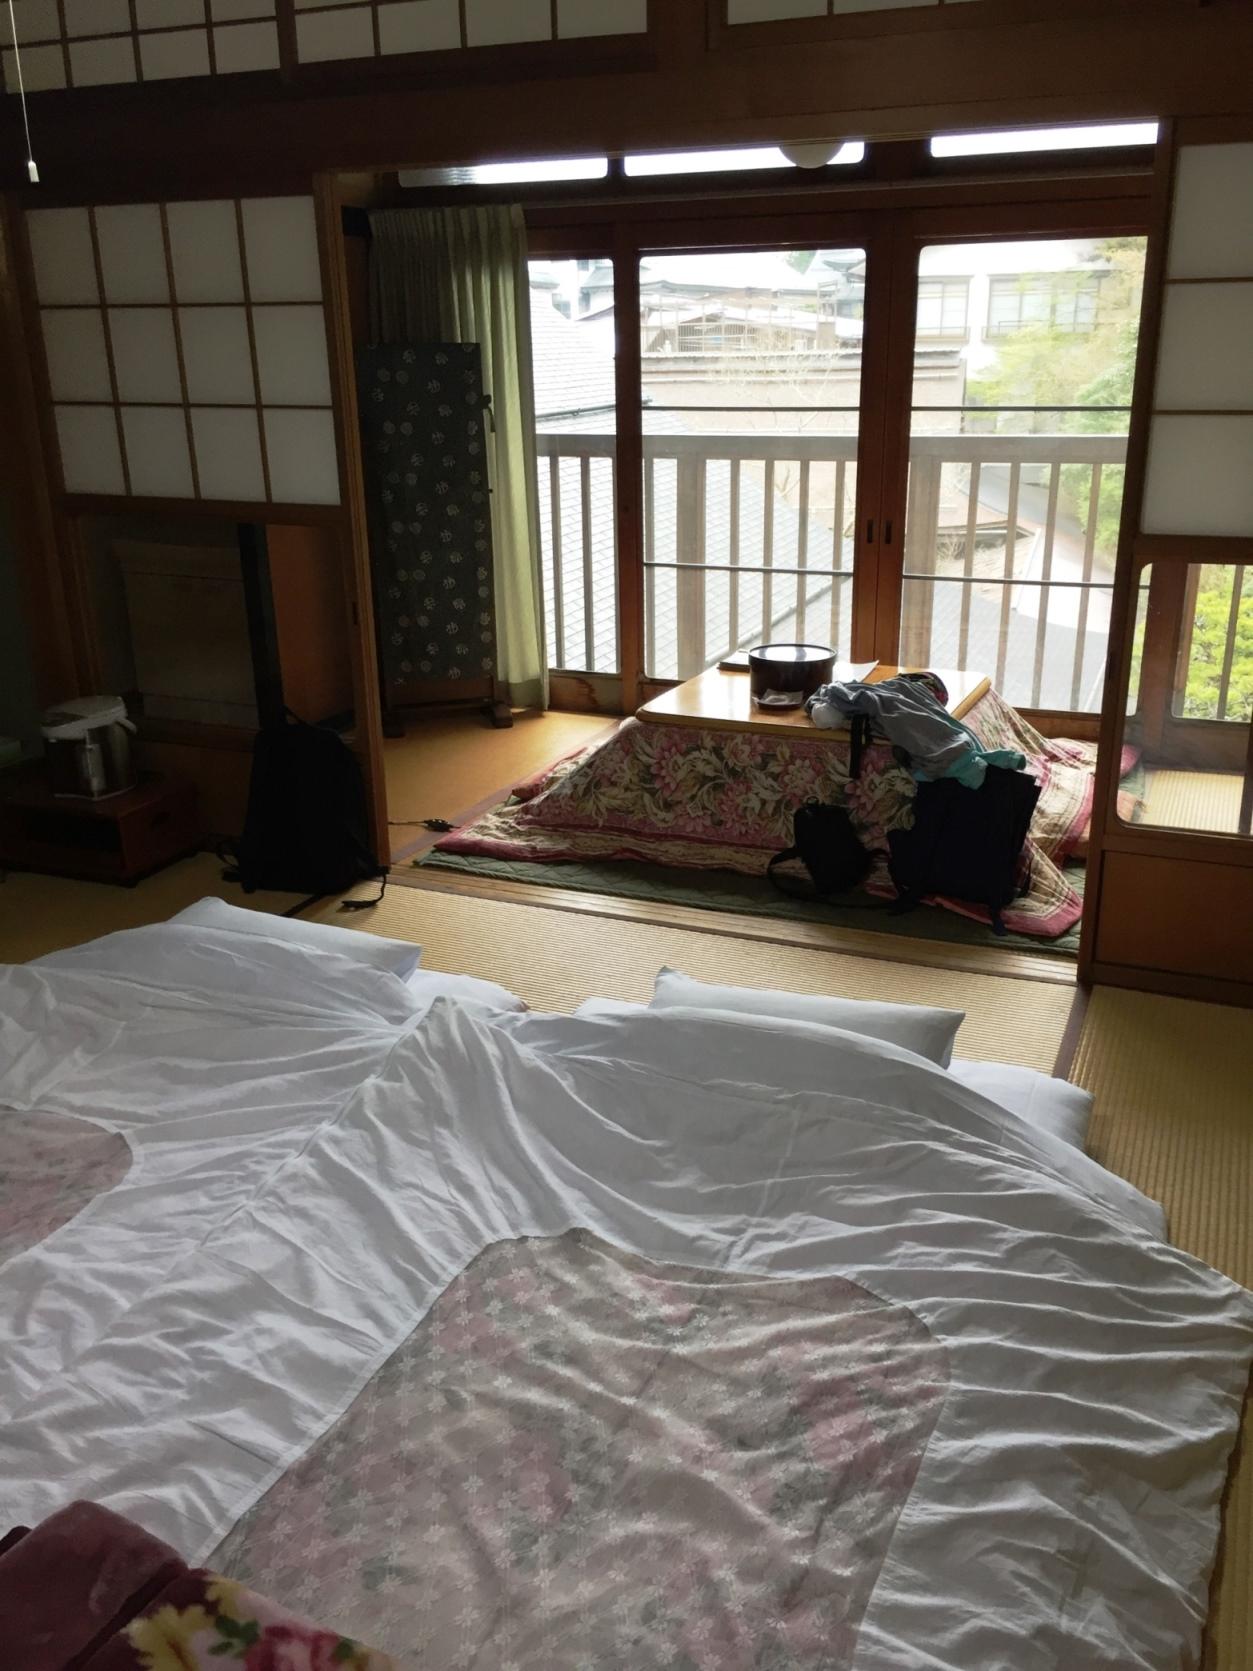 Giappone - organizzare un viaggio - Journeydraft - Ryokan